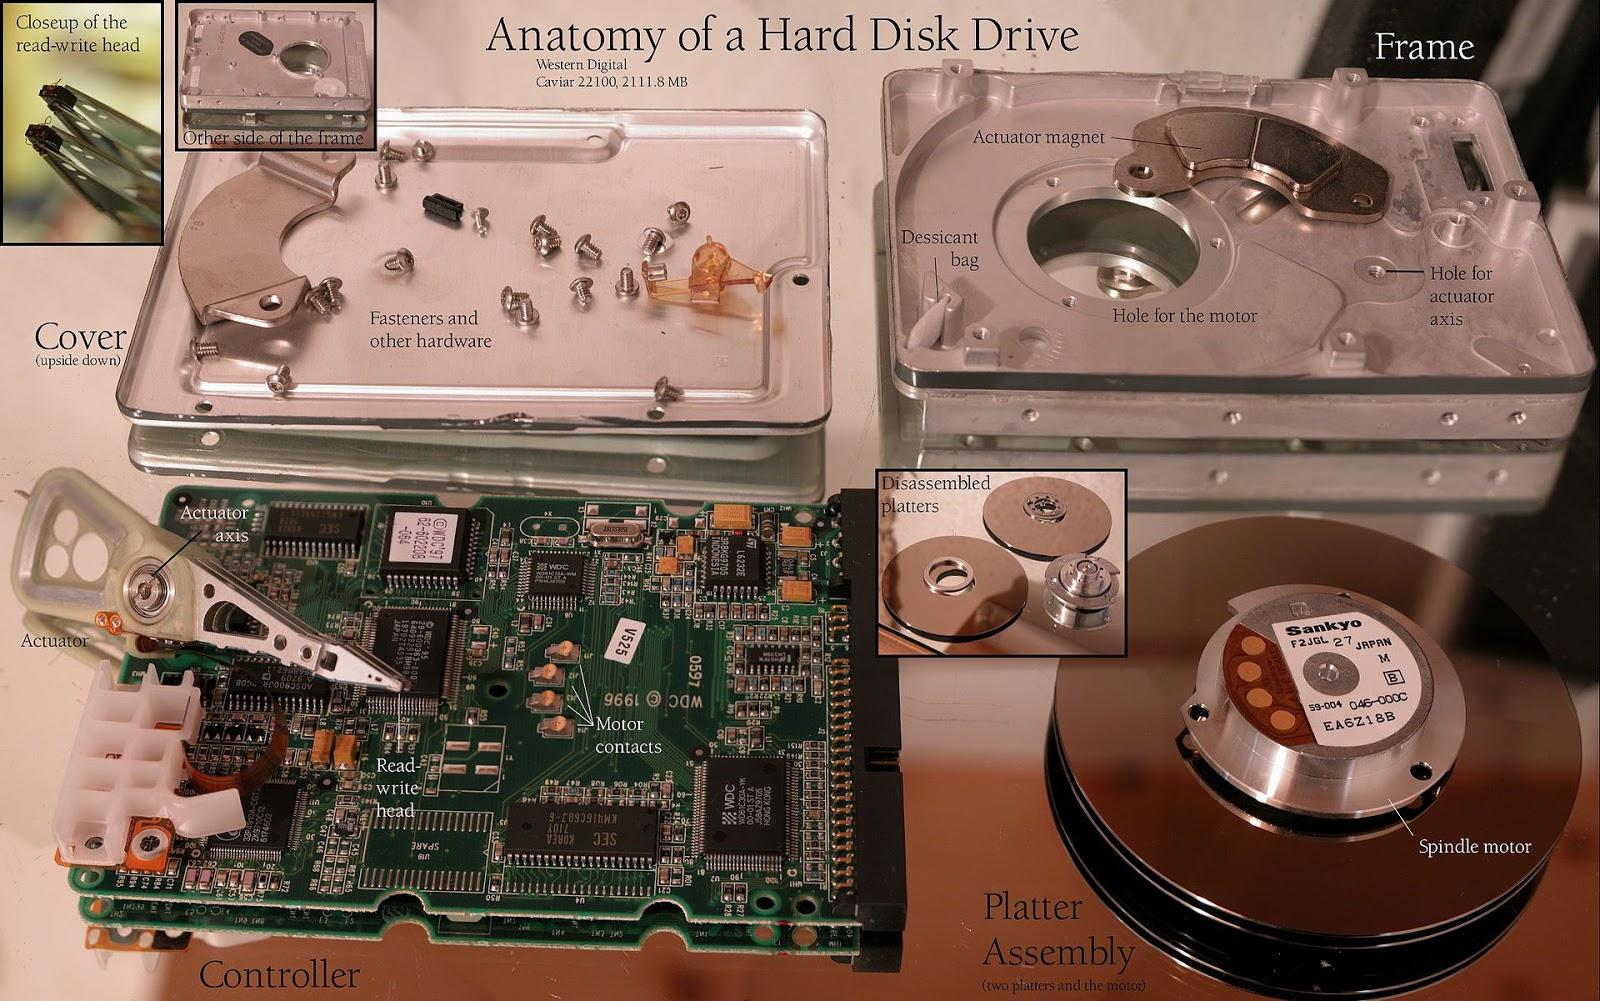 HardDiskAnatomy.jpg